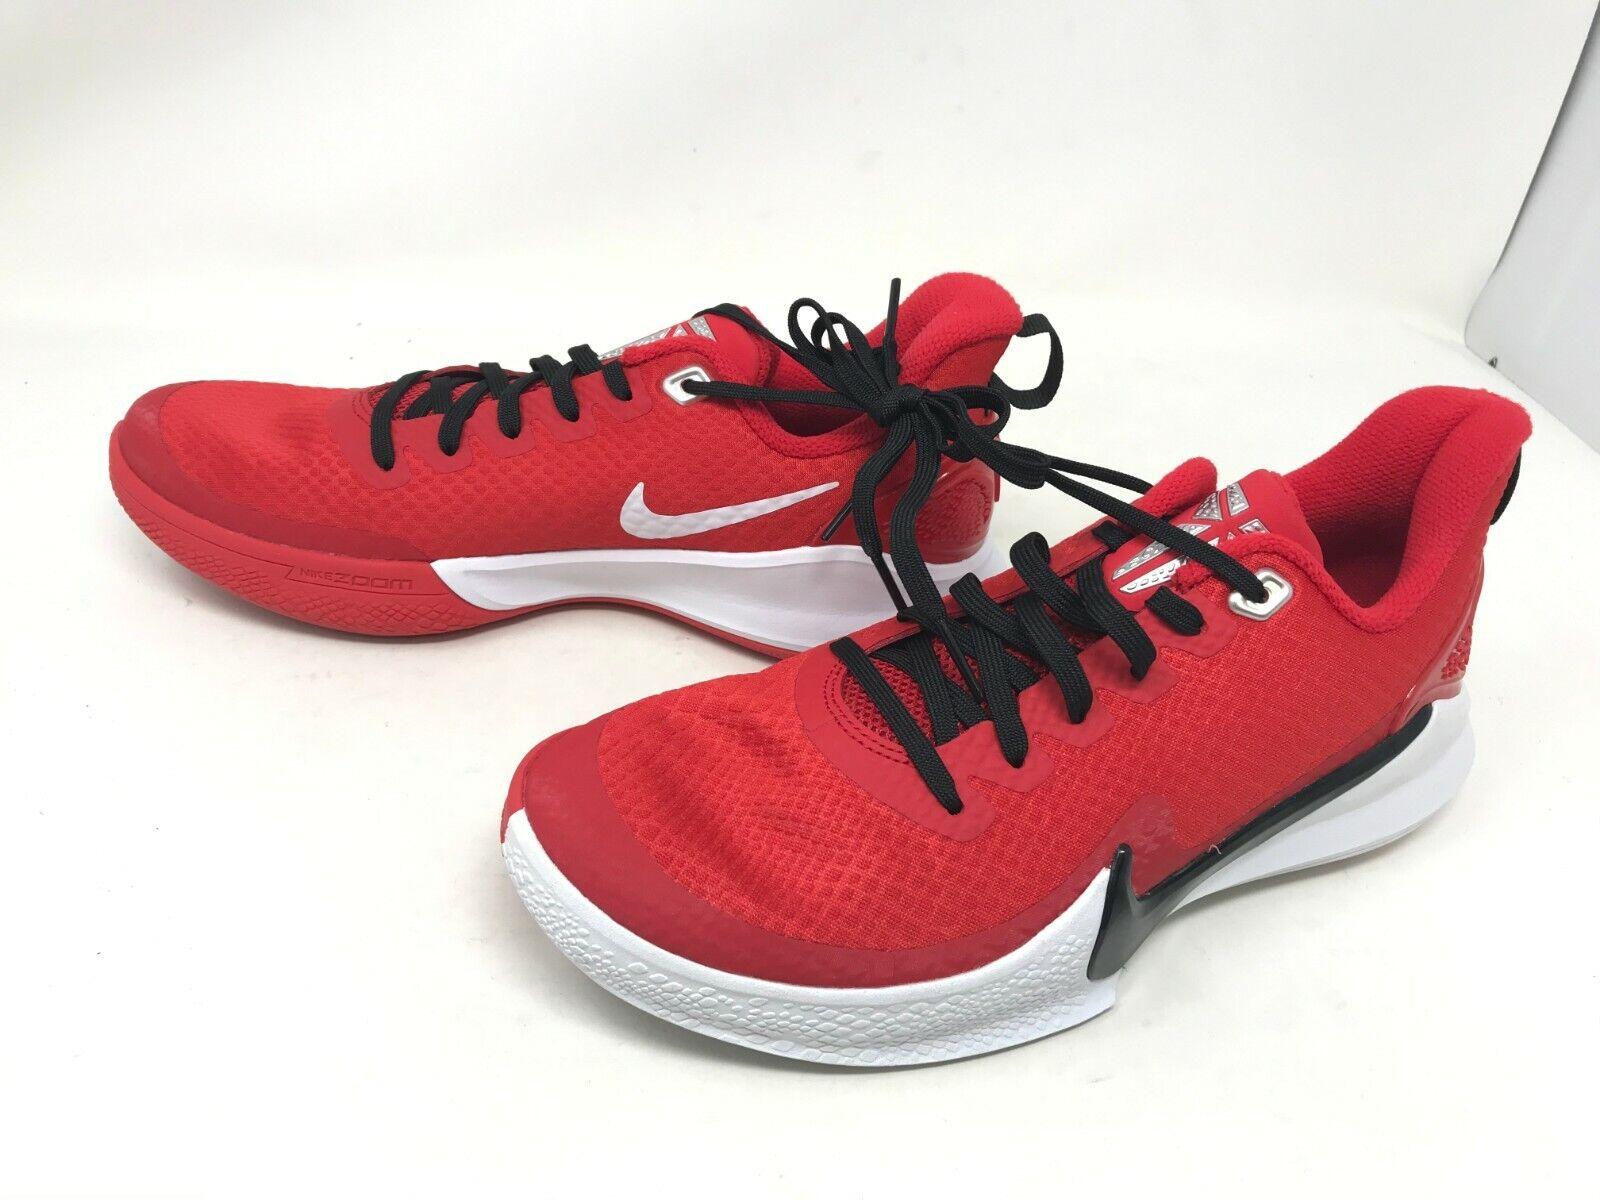 Mens Nike (AT1214-600) Mamba Focus TB University Red sneakers (456E)